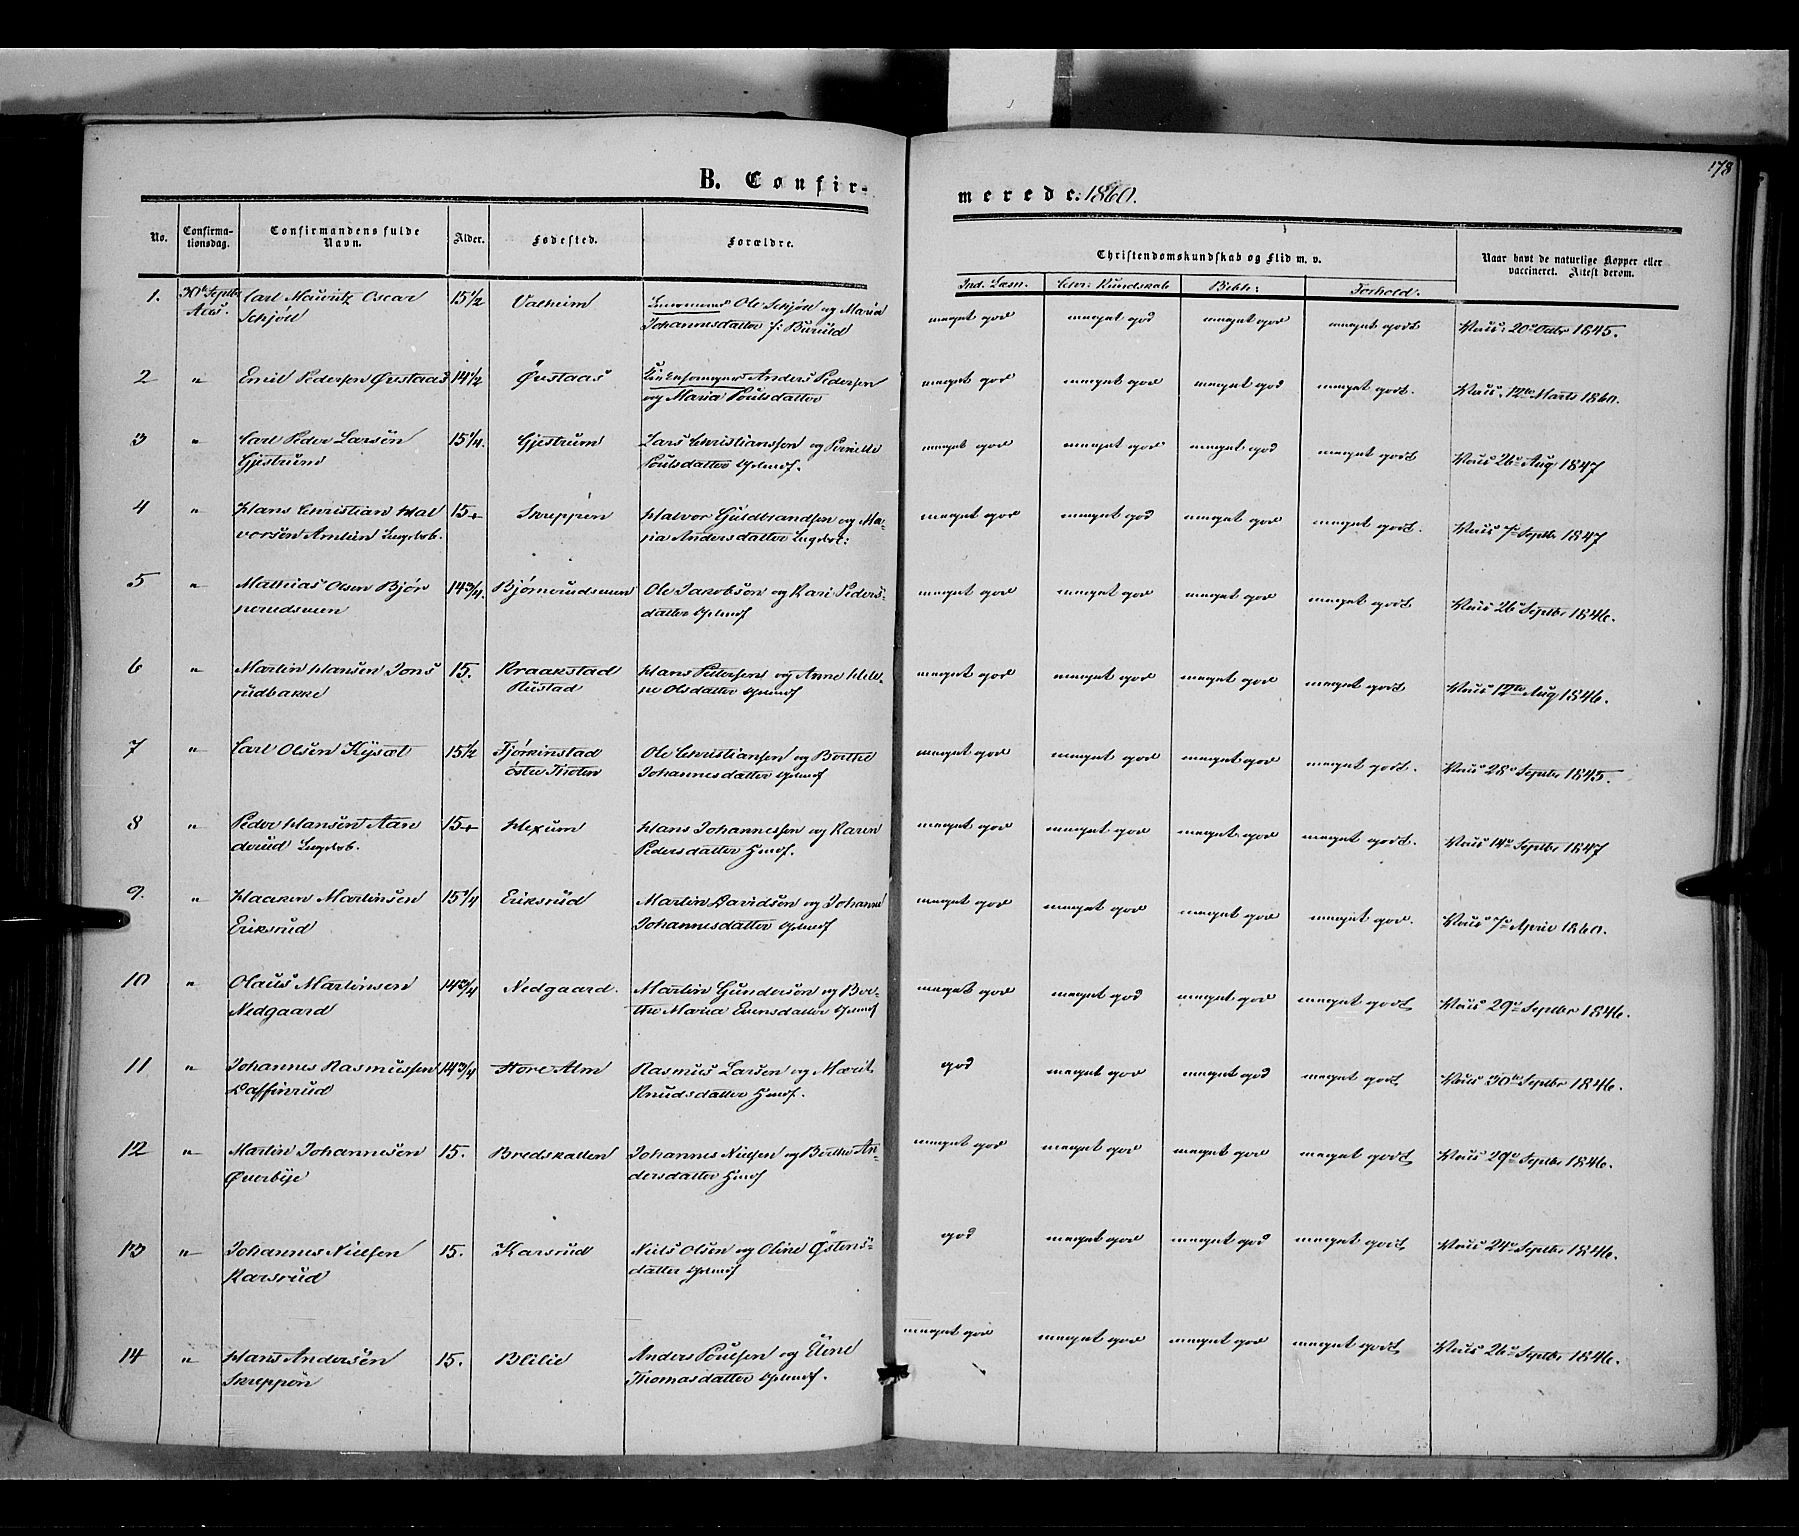 SAH, Vestre Toten prestekontor, H/Ha/Haa/L0006: Ministerialbok nr. 6, 1856-1861, s. 178